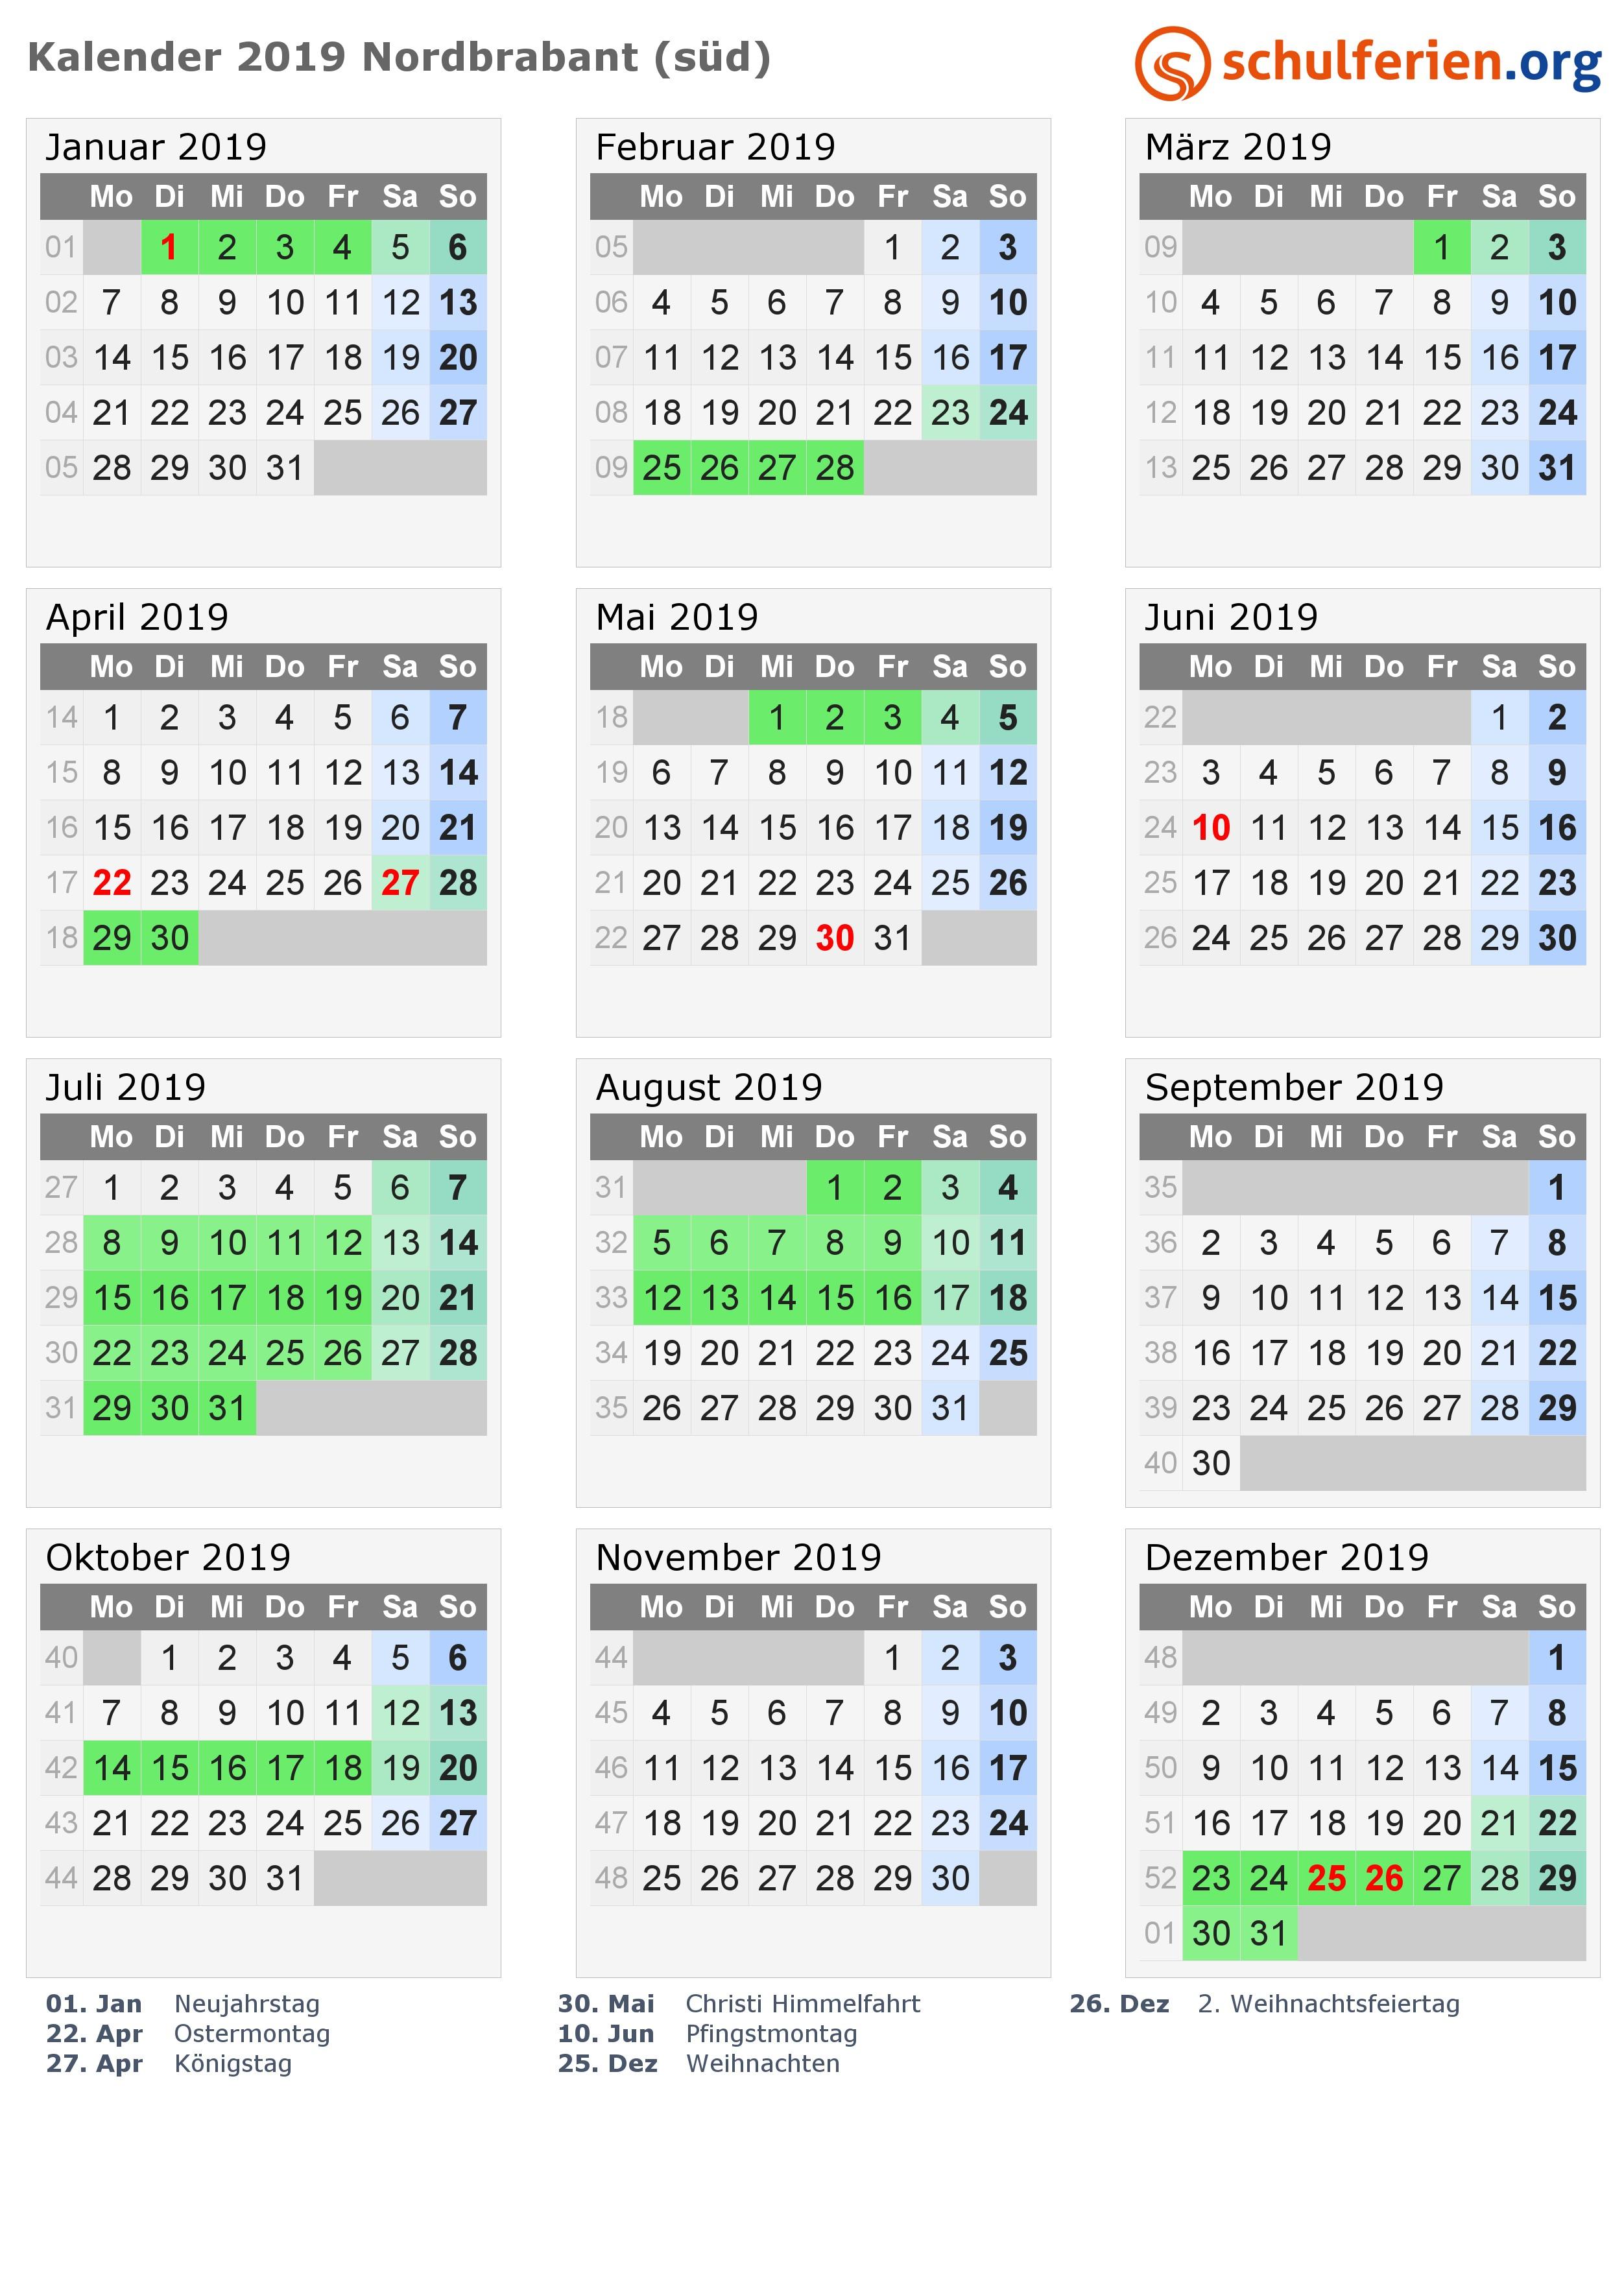 Kalender 2019 Nordbrabant süd